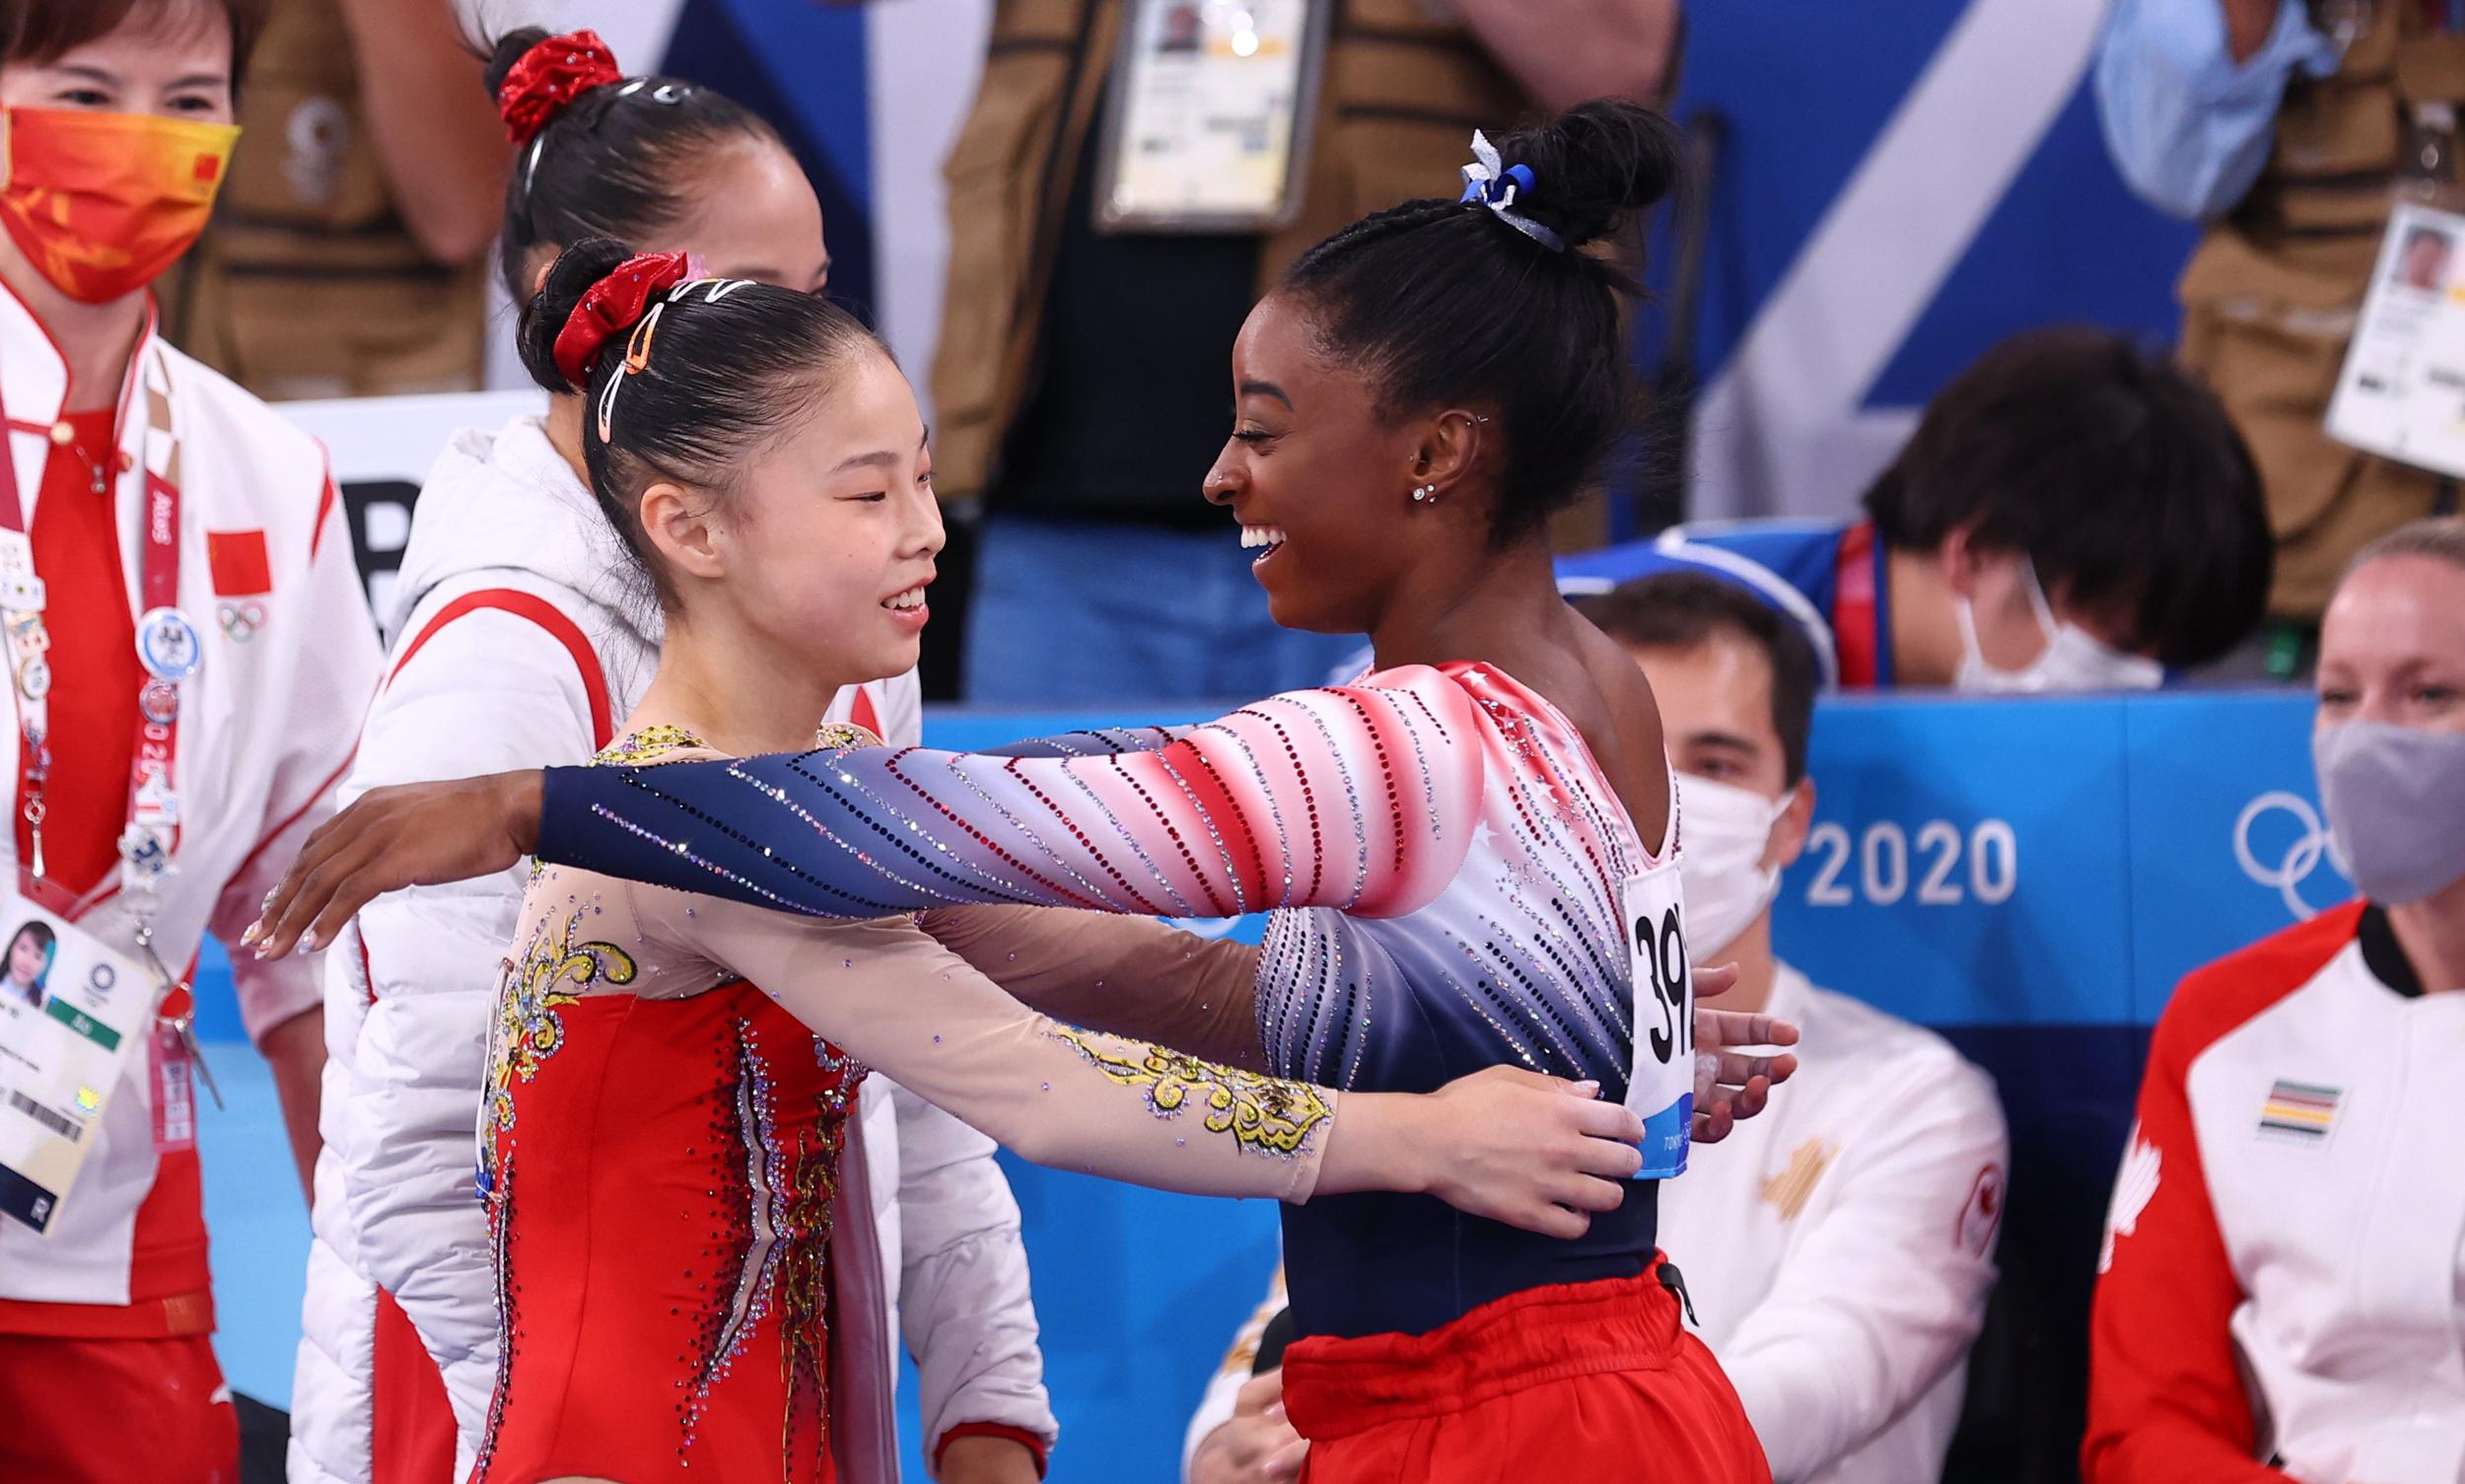 U.S.-China Olympic solidarity warms hearts after gymnastics final